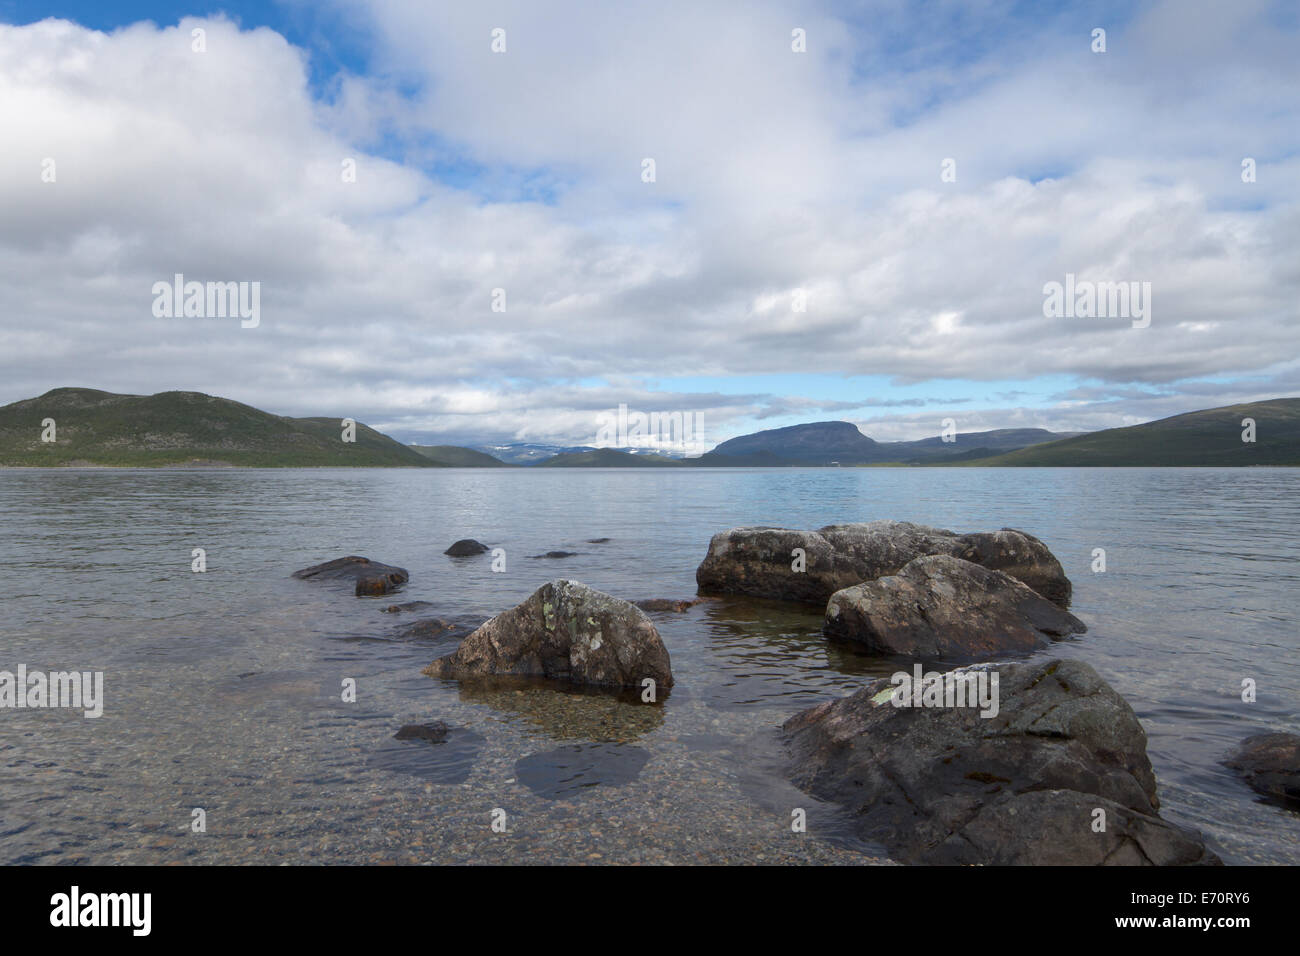 Kilpisjärvi - Stock Image